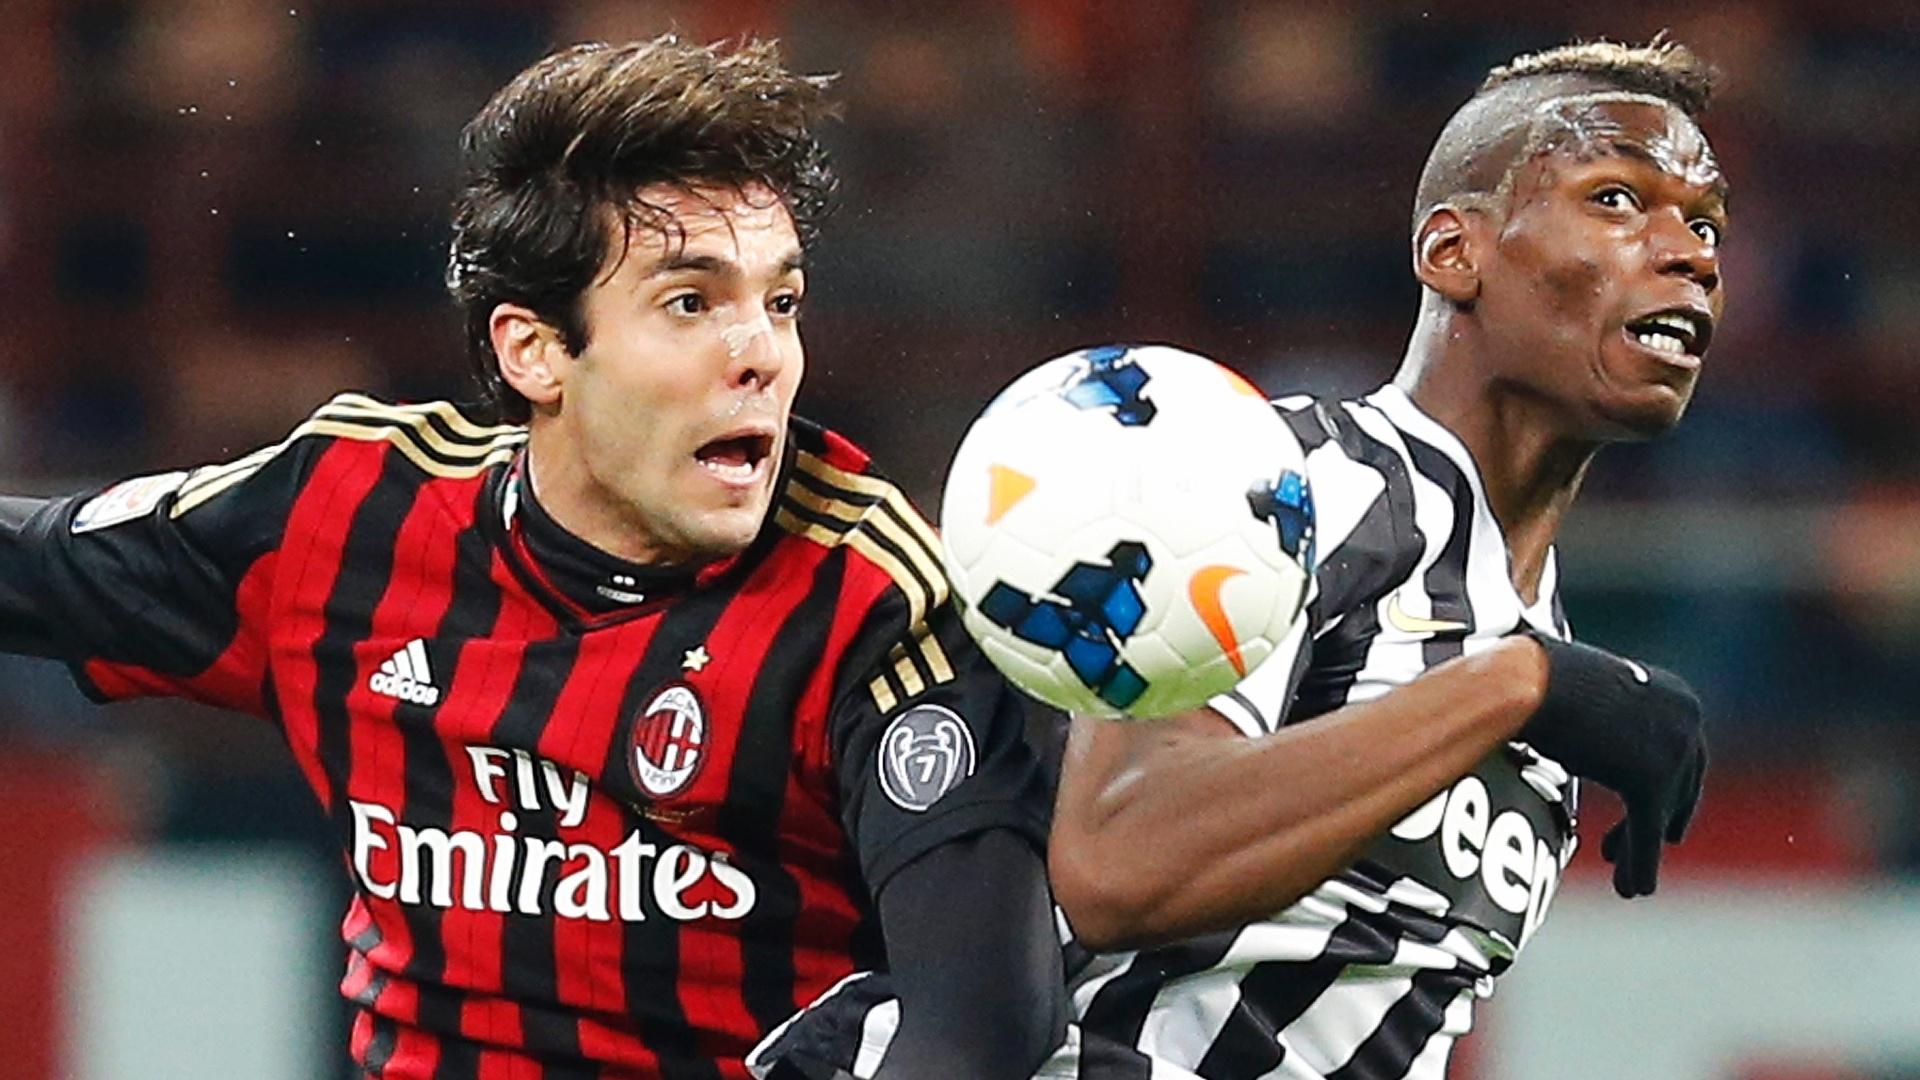 02.mar.2014 - Meia Kaká disputa bola com Pogba, no clássico entre Milan e Juventus, no estádio San Siro, pelo Campeonato Italiano